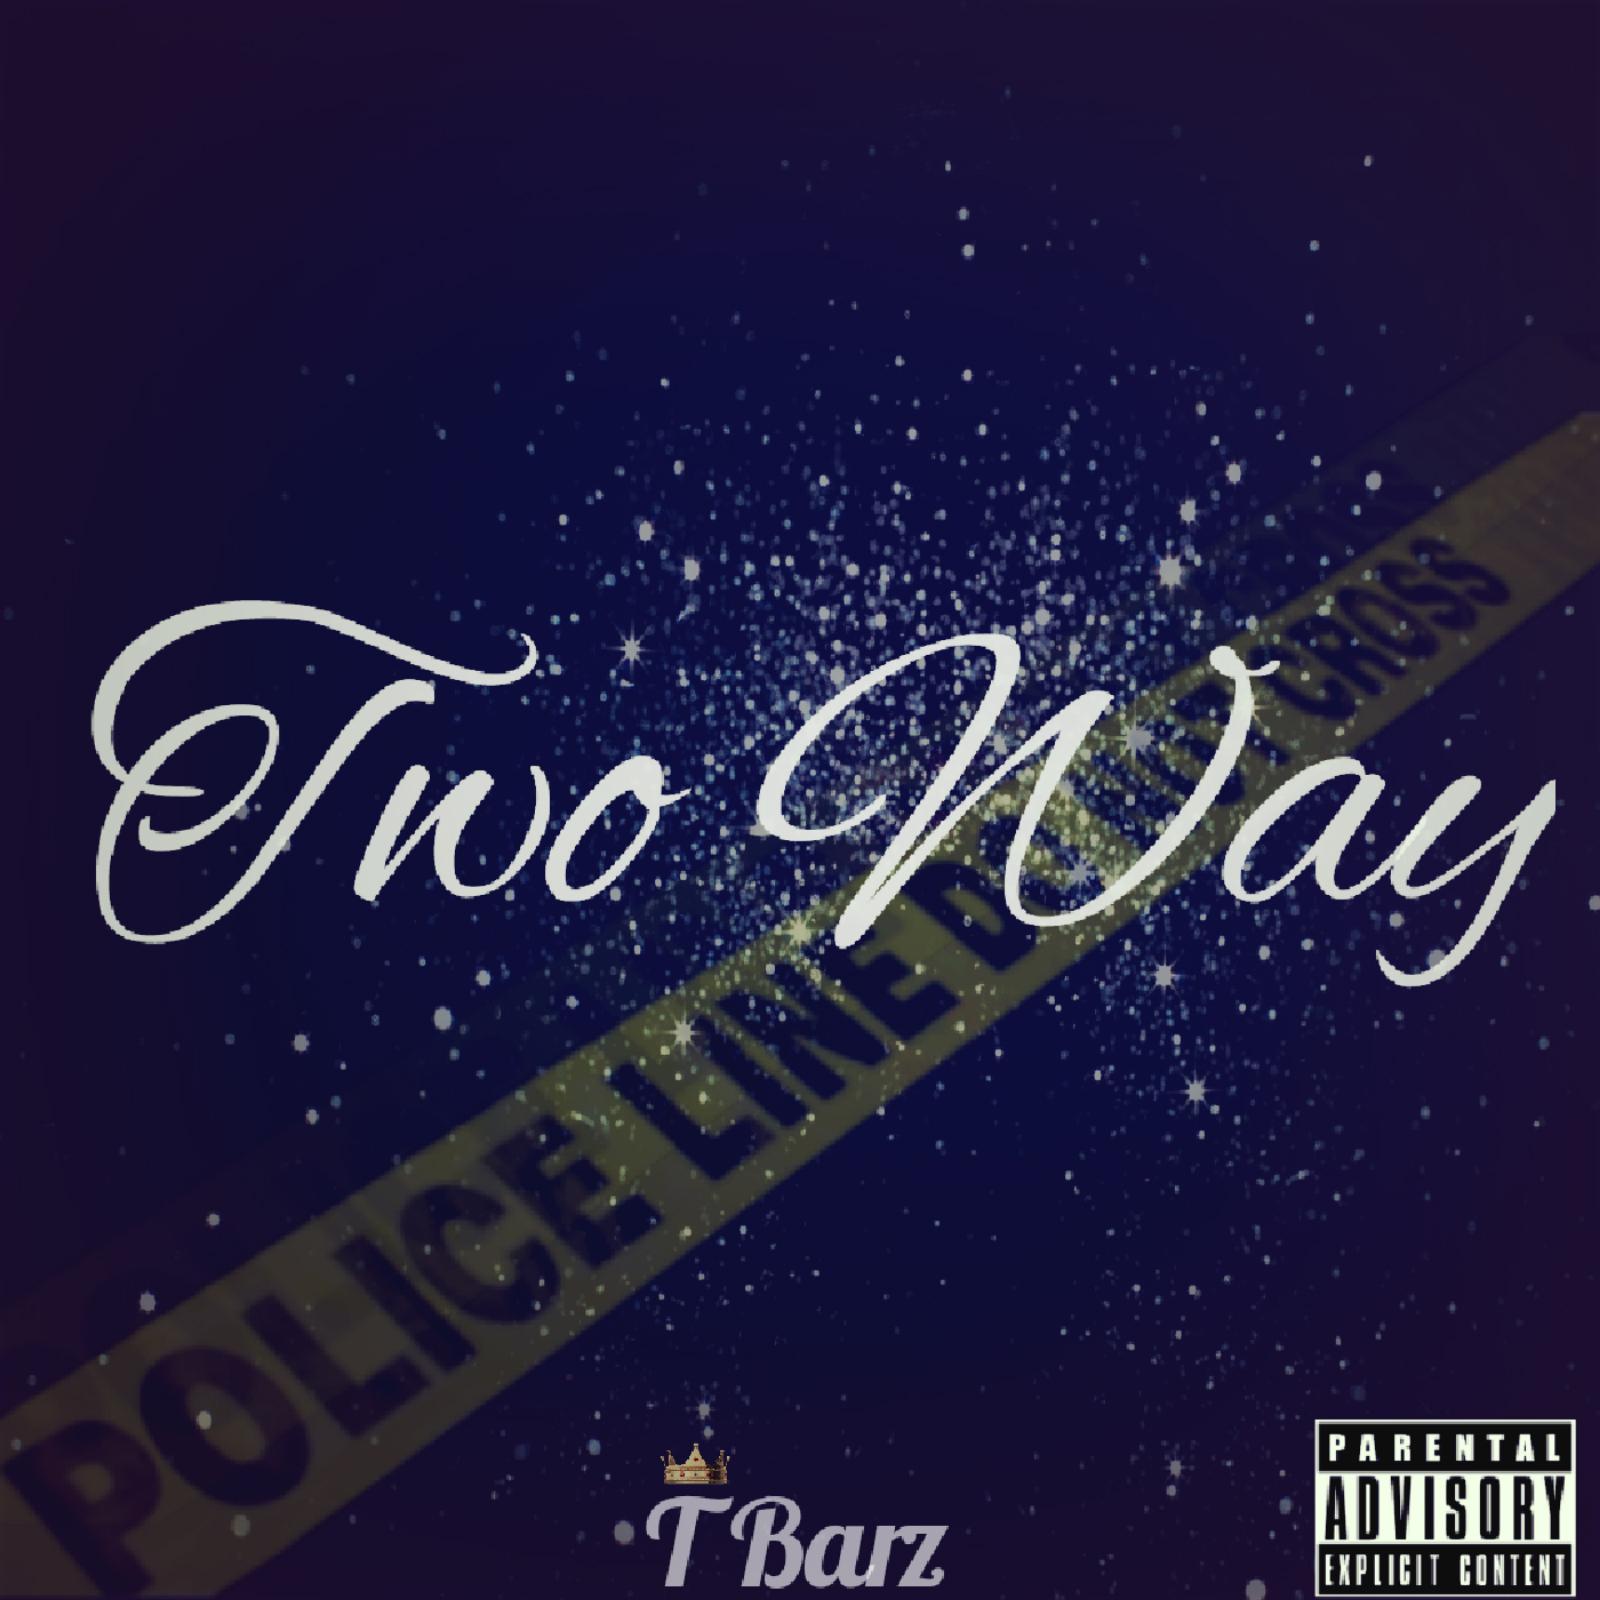 T Barz